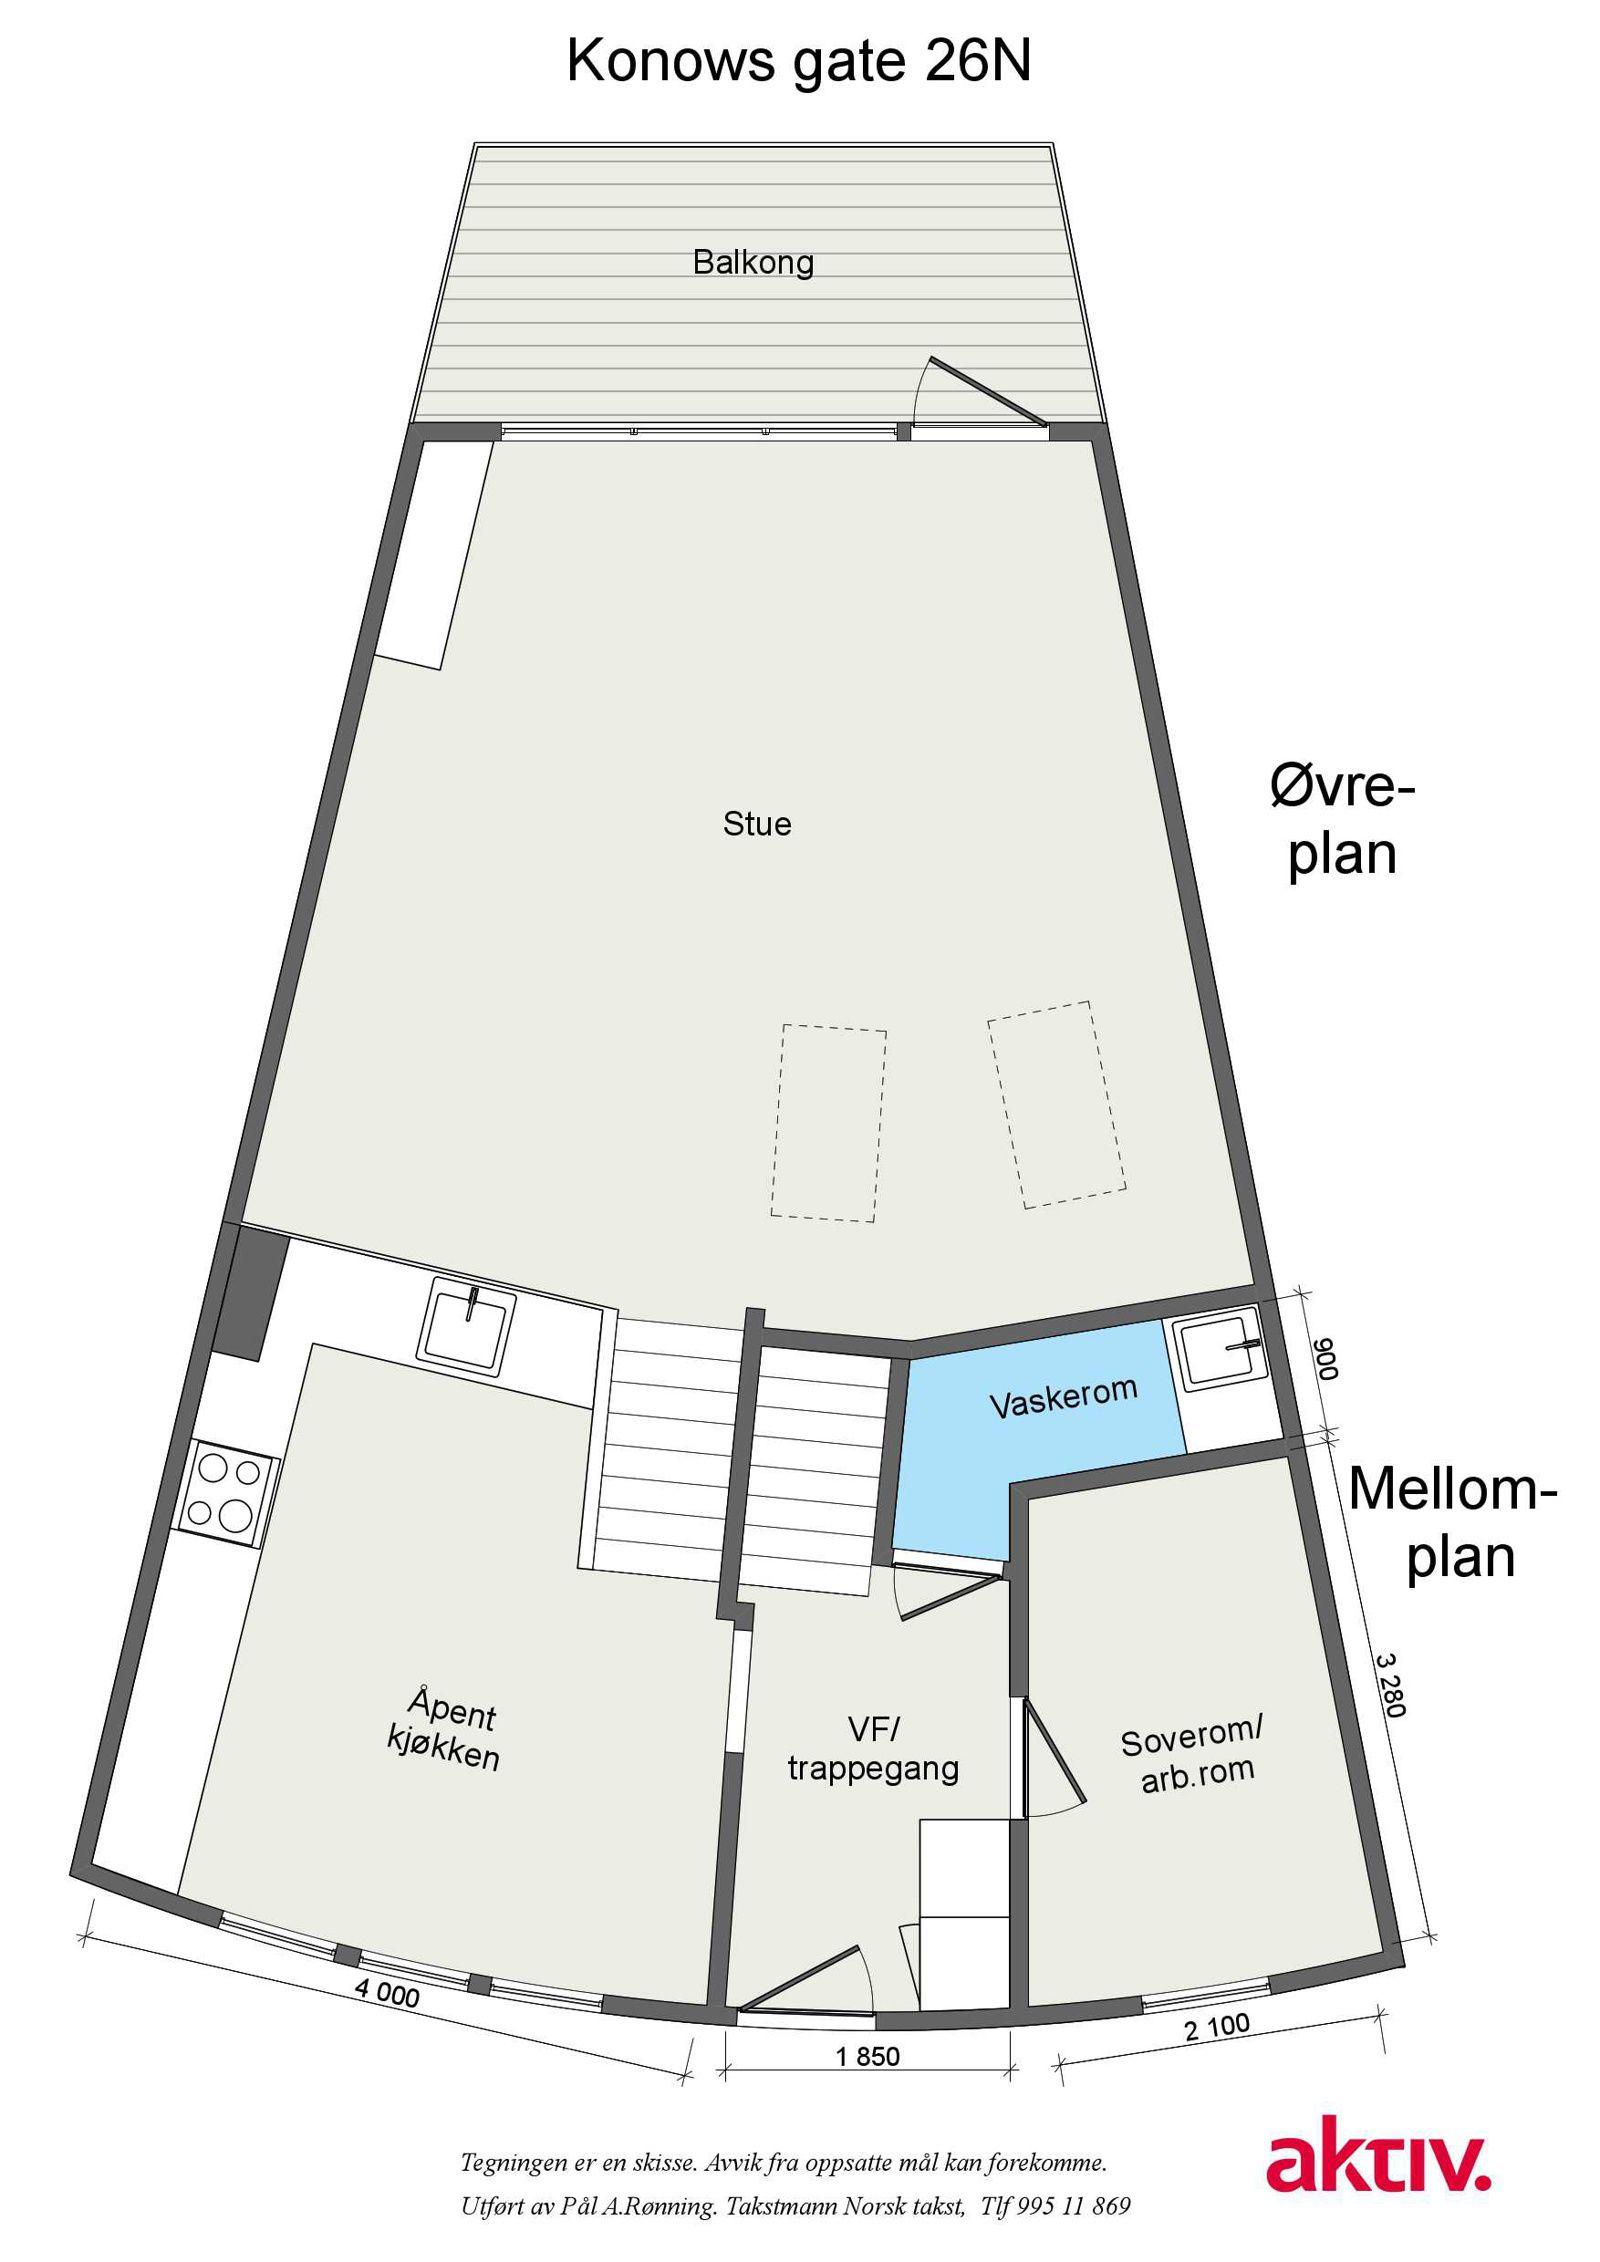 Konows gate 26N Plantegning - Plan 1.